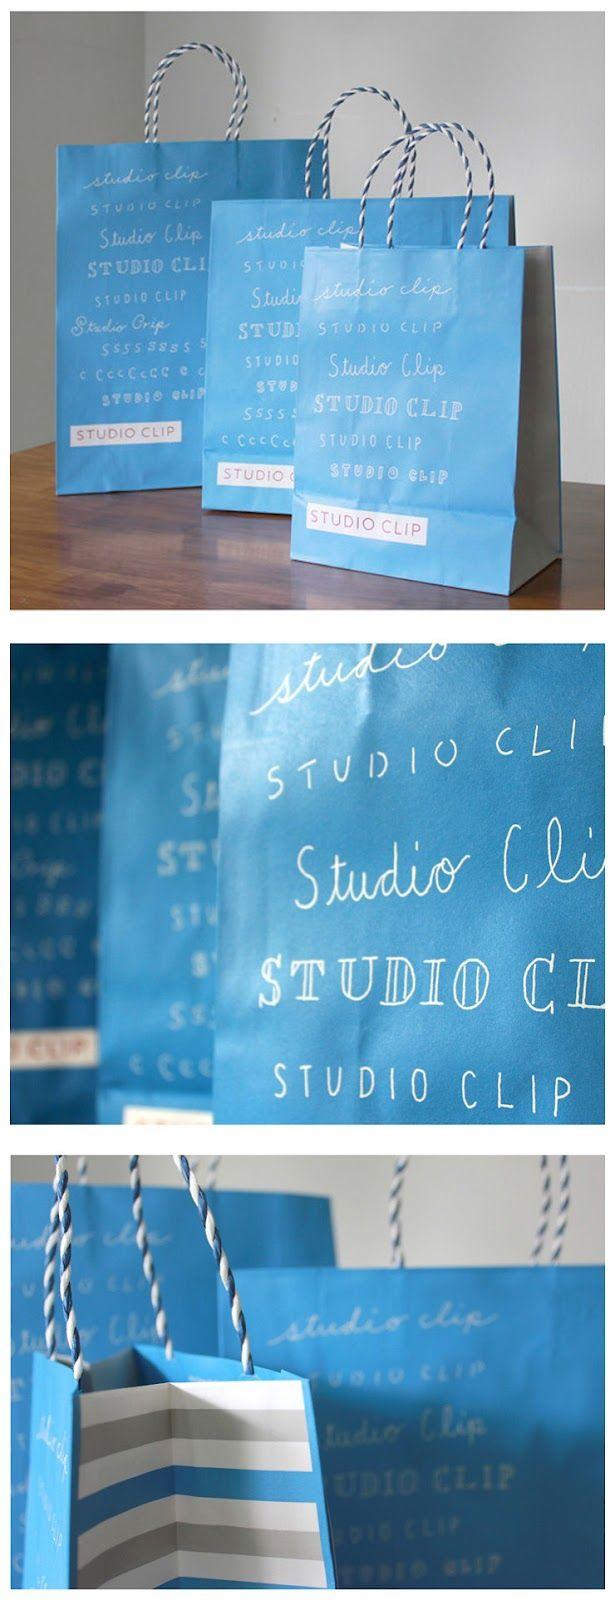 woolen / graphic: blue bags